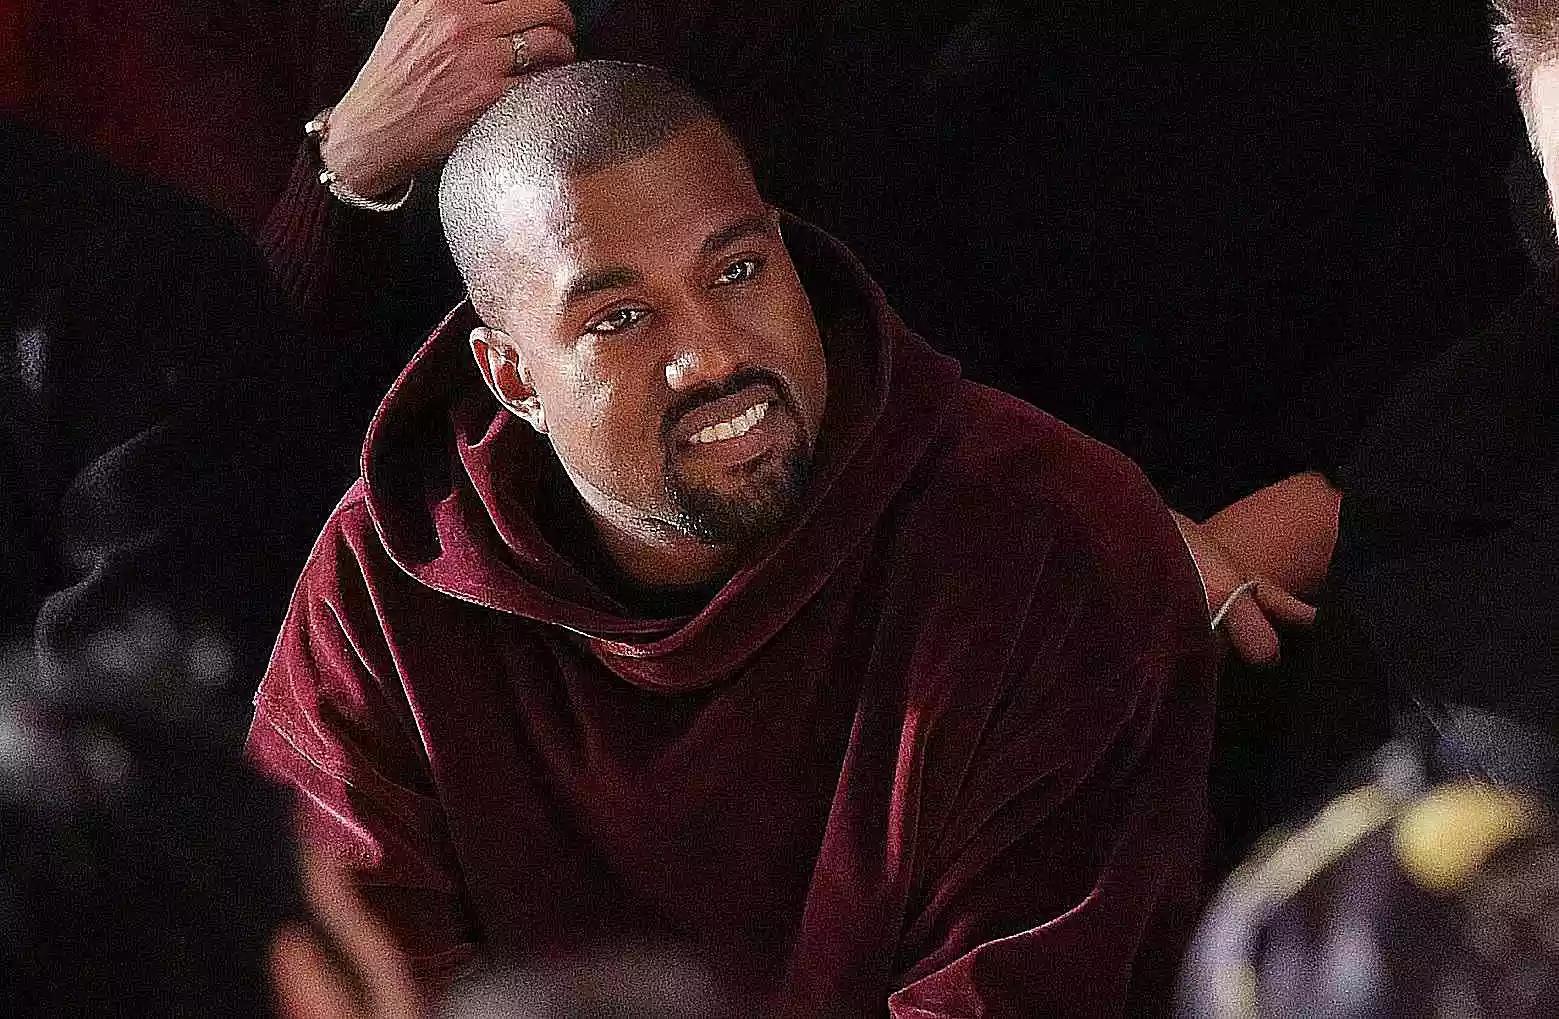 Kanye-West-58b8d9ad3df78c353c234179.jpg